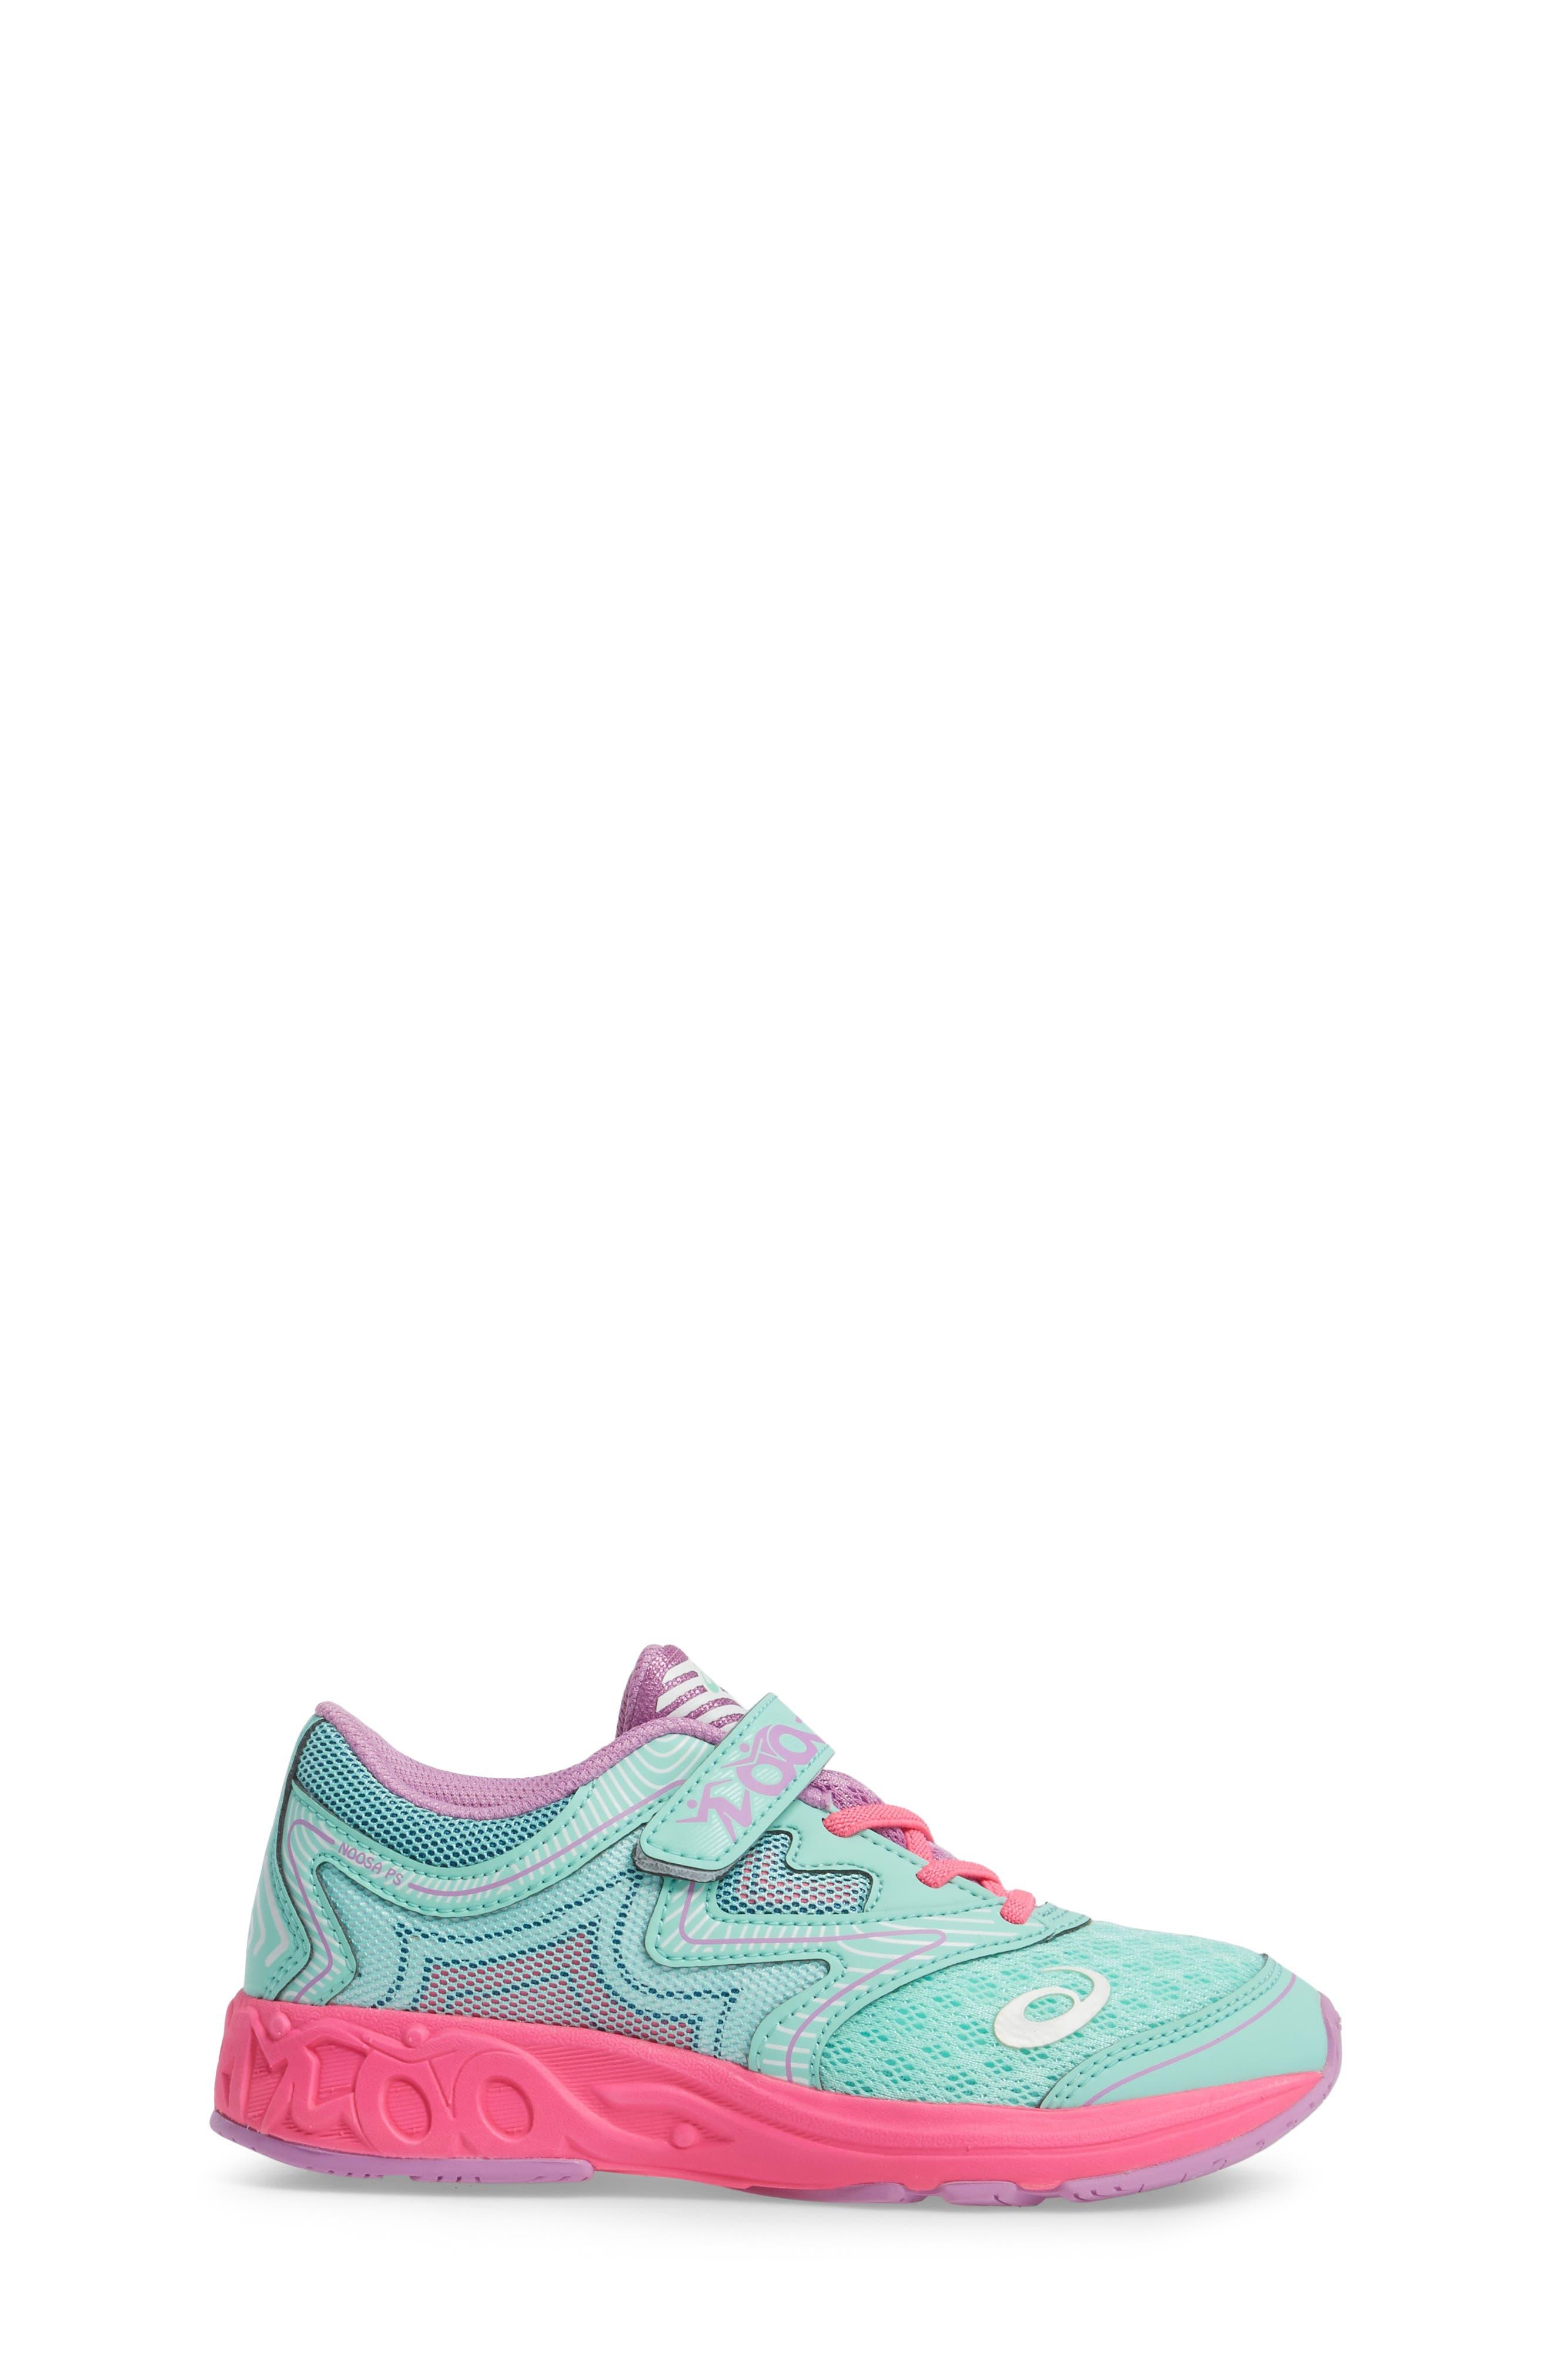 Noosa PS Sneaker,                             Alternate thumbnail 3, color,                             330